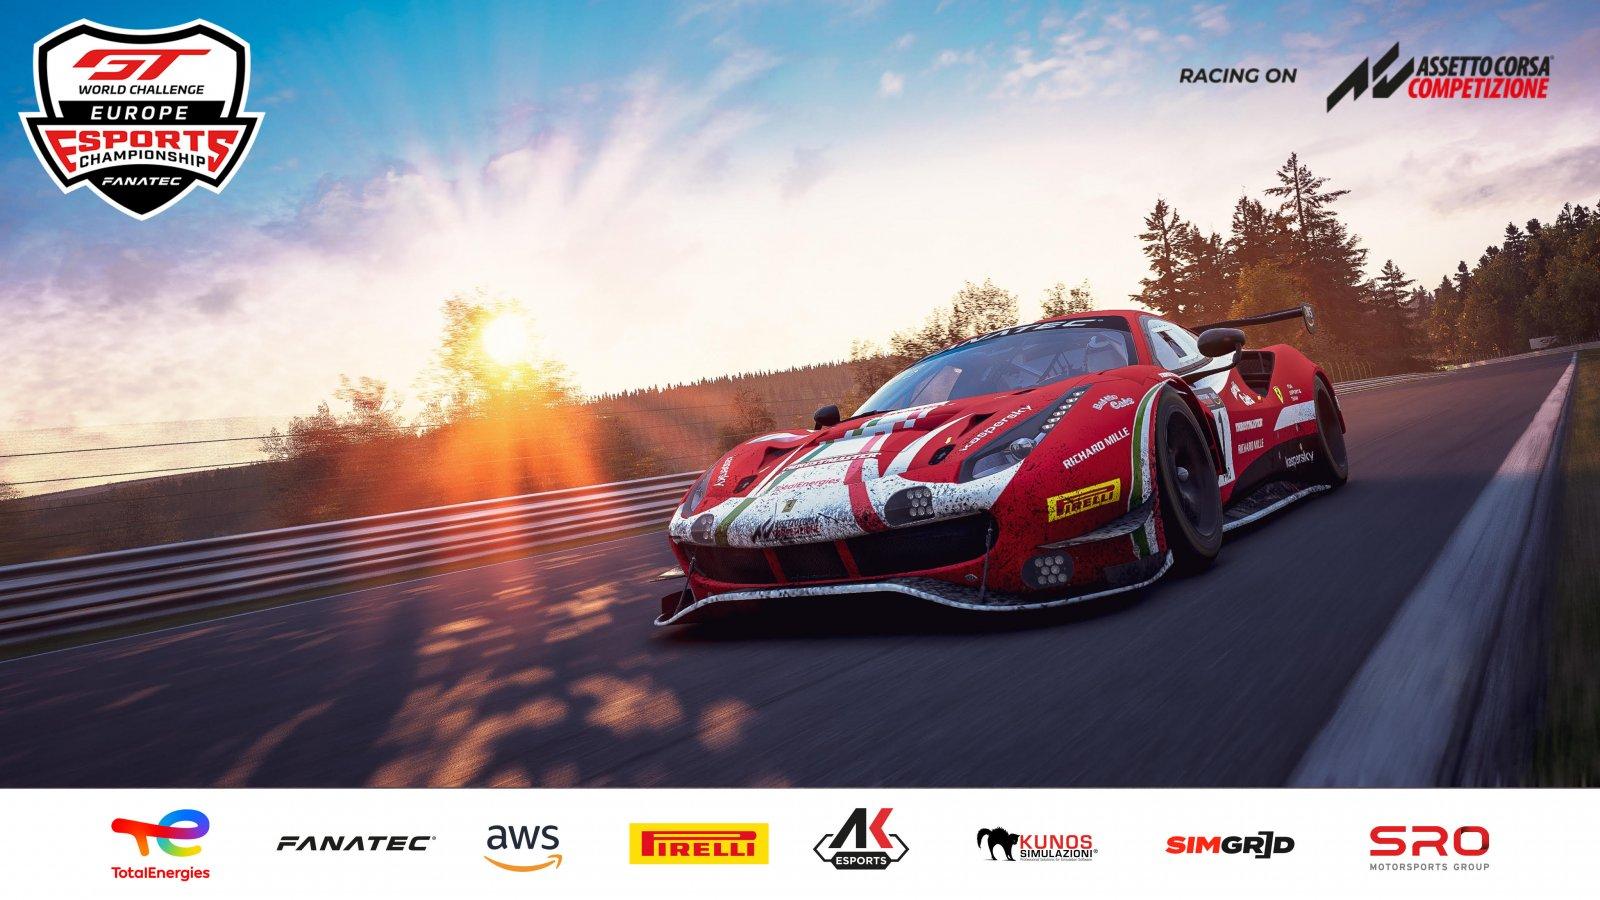 ESPORTS: FDA Esports Team celebrates 24 Hours of Spa victory thanks to ultra-professional performance from Ferrari crew